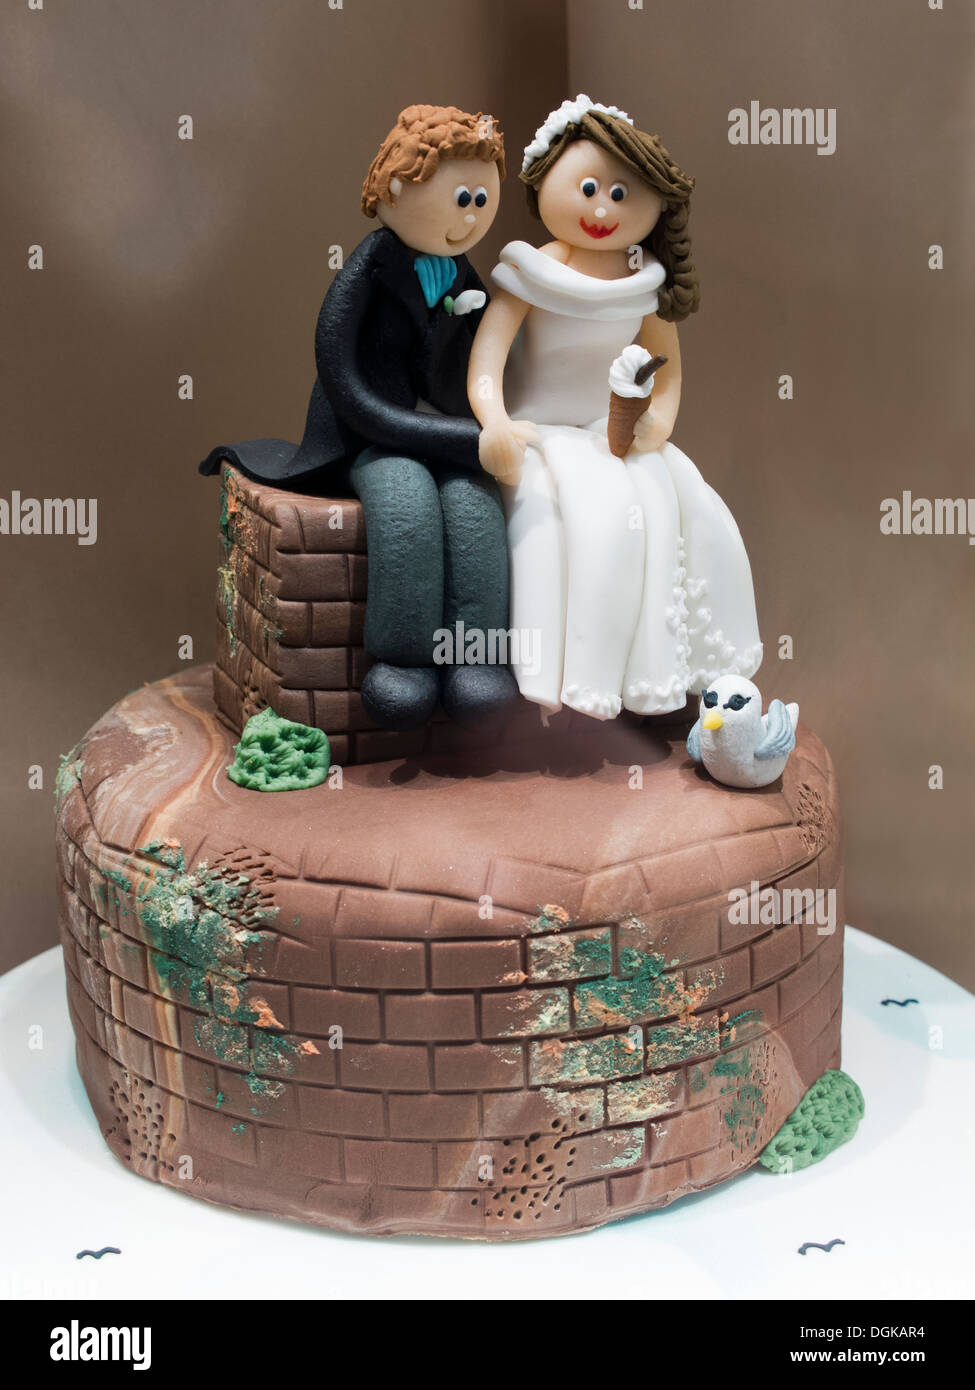 Wedding cake decoration shop dublin choice image wedding dress wedding cake decoration shop dublin images wedding dress wedding cake decoration shop dublin image collections wedding junglespirit Gallery